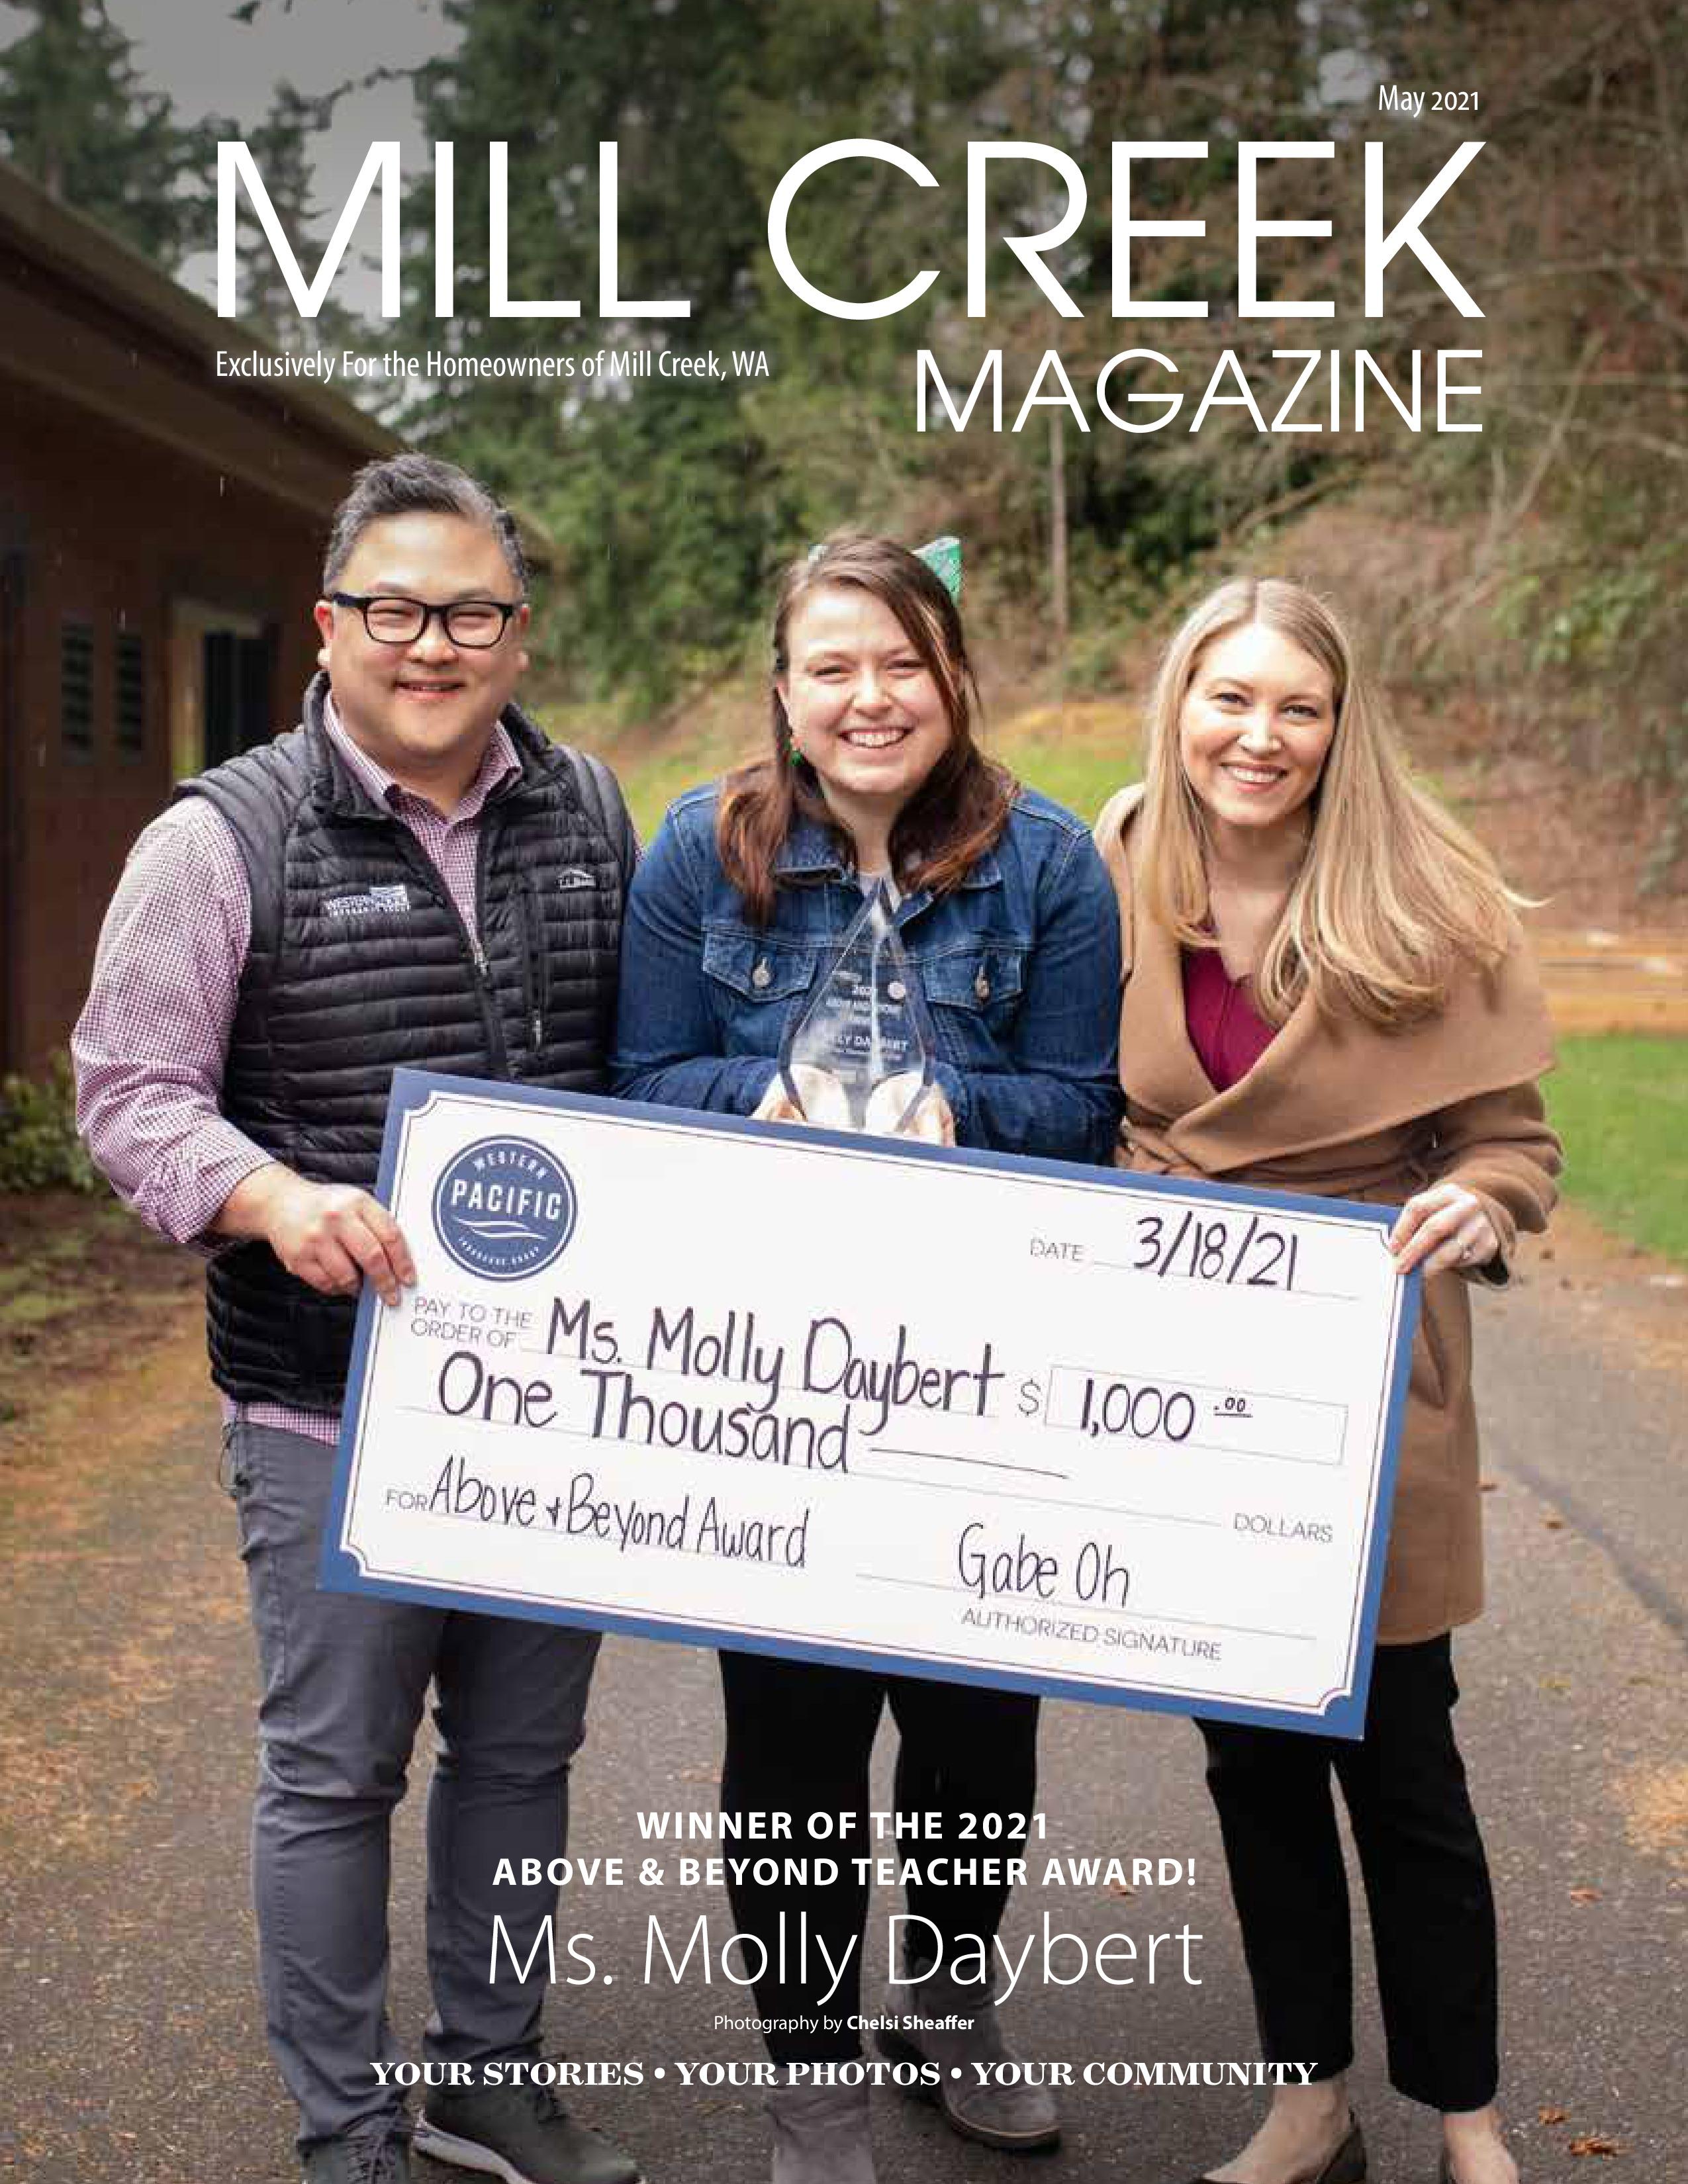 Mill Creek Magazine 2021-05-01